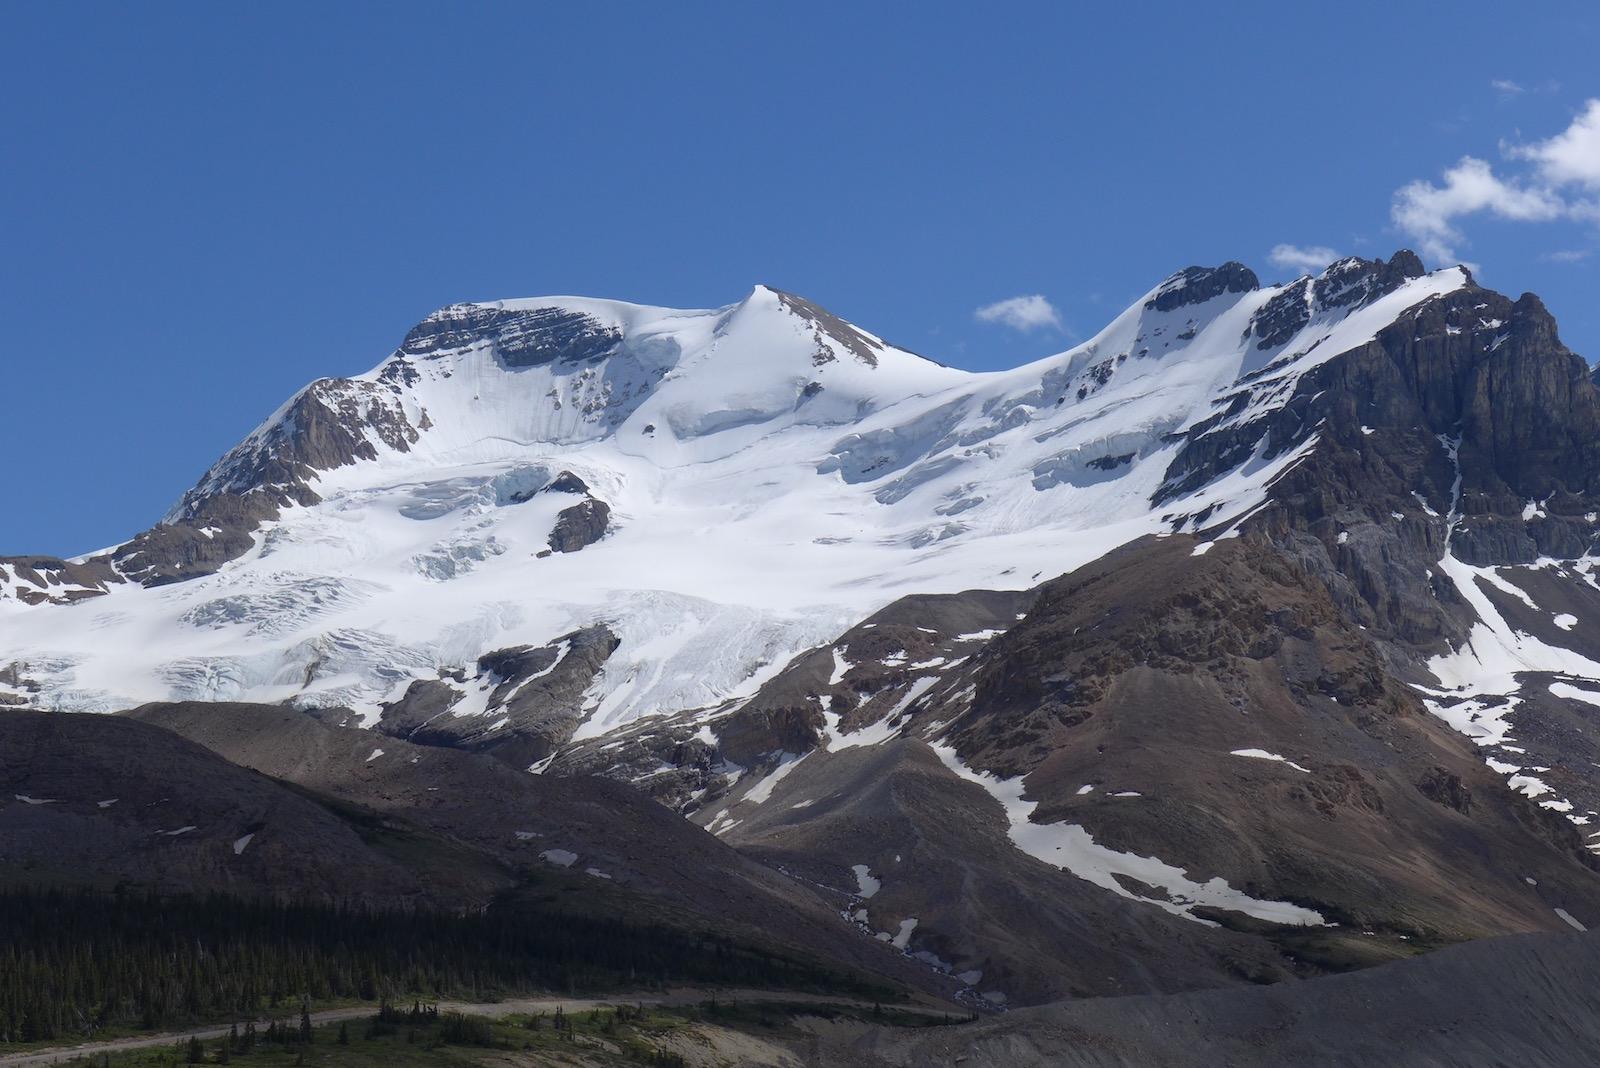 mount athabasca jasper national park alicja gados photo